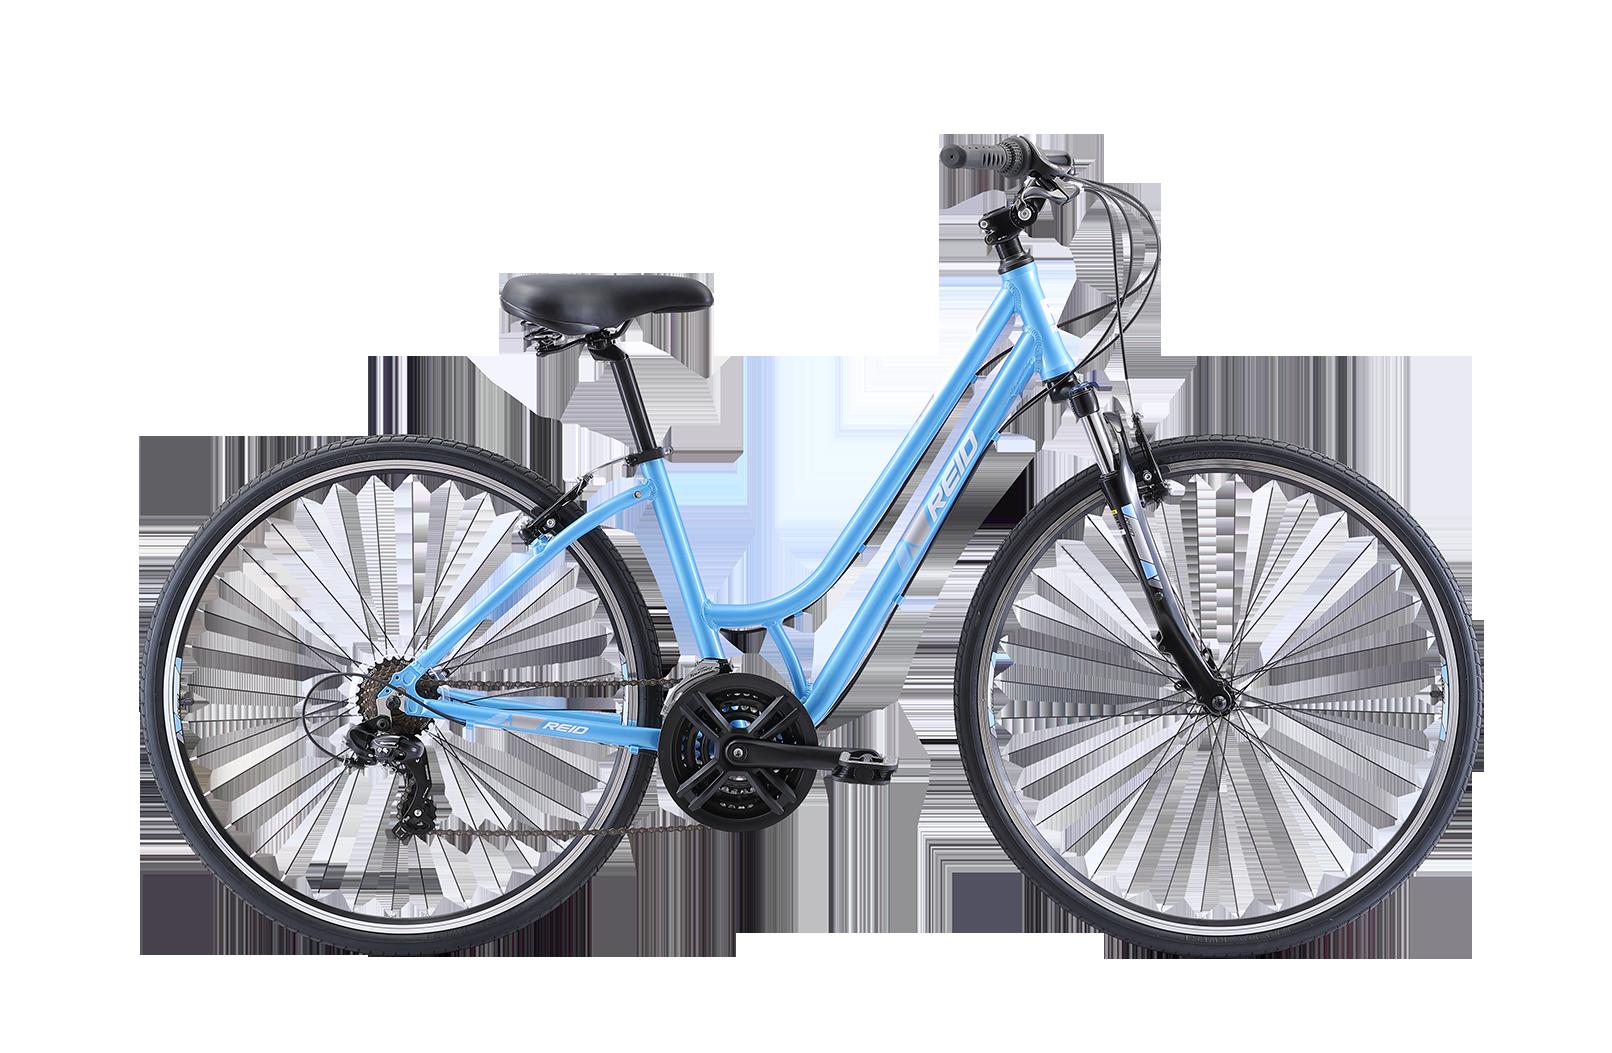 IMG 0018 - Reid ® - Comfort 2 Step Thru Bike 2020